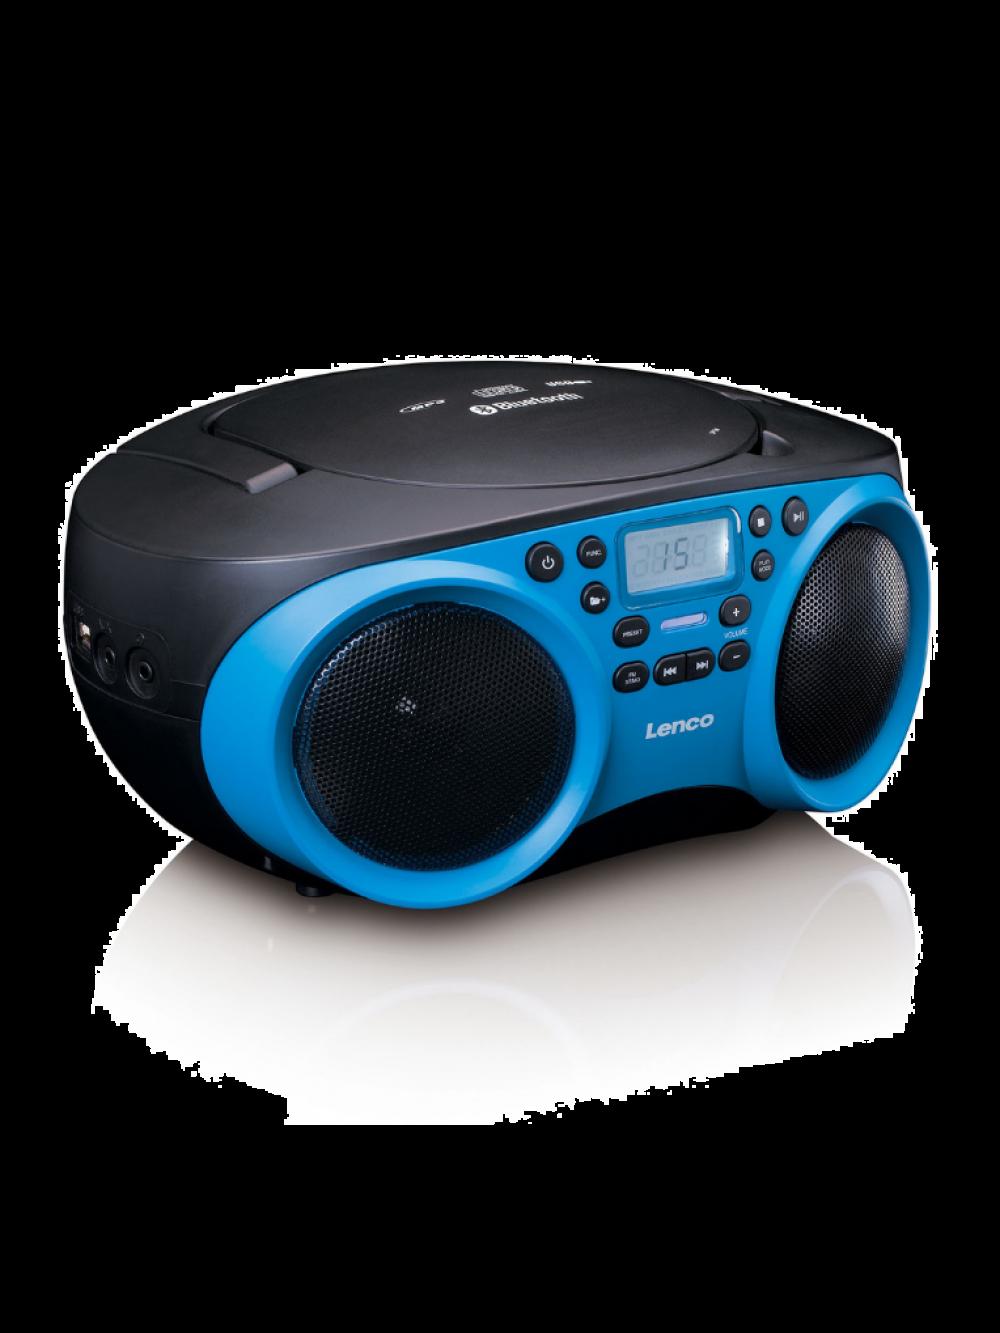 Lenco SCD-501BU φορητό ράδιο-cd player με επιλογές CD,MP3,USB,BT και AUX-IN